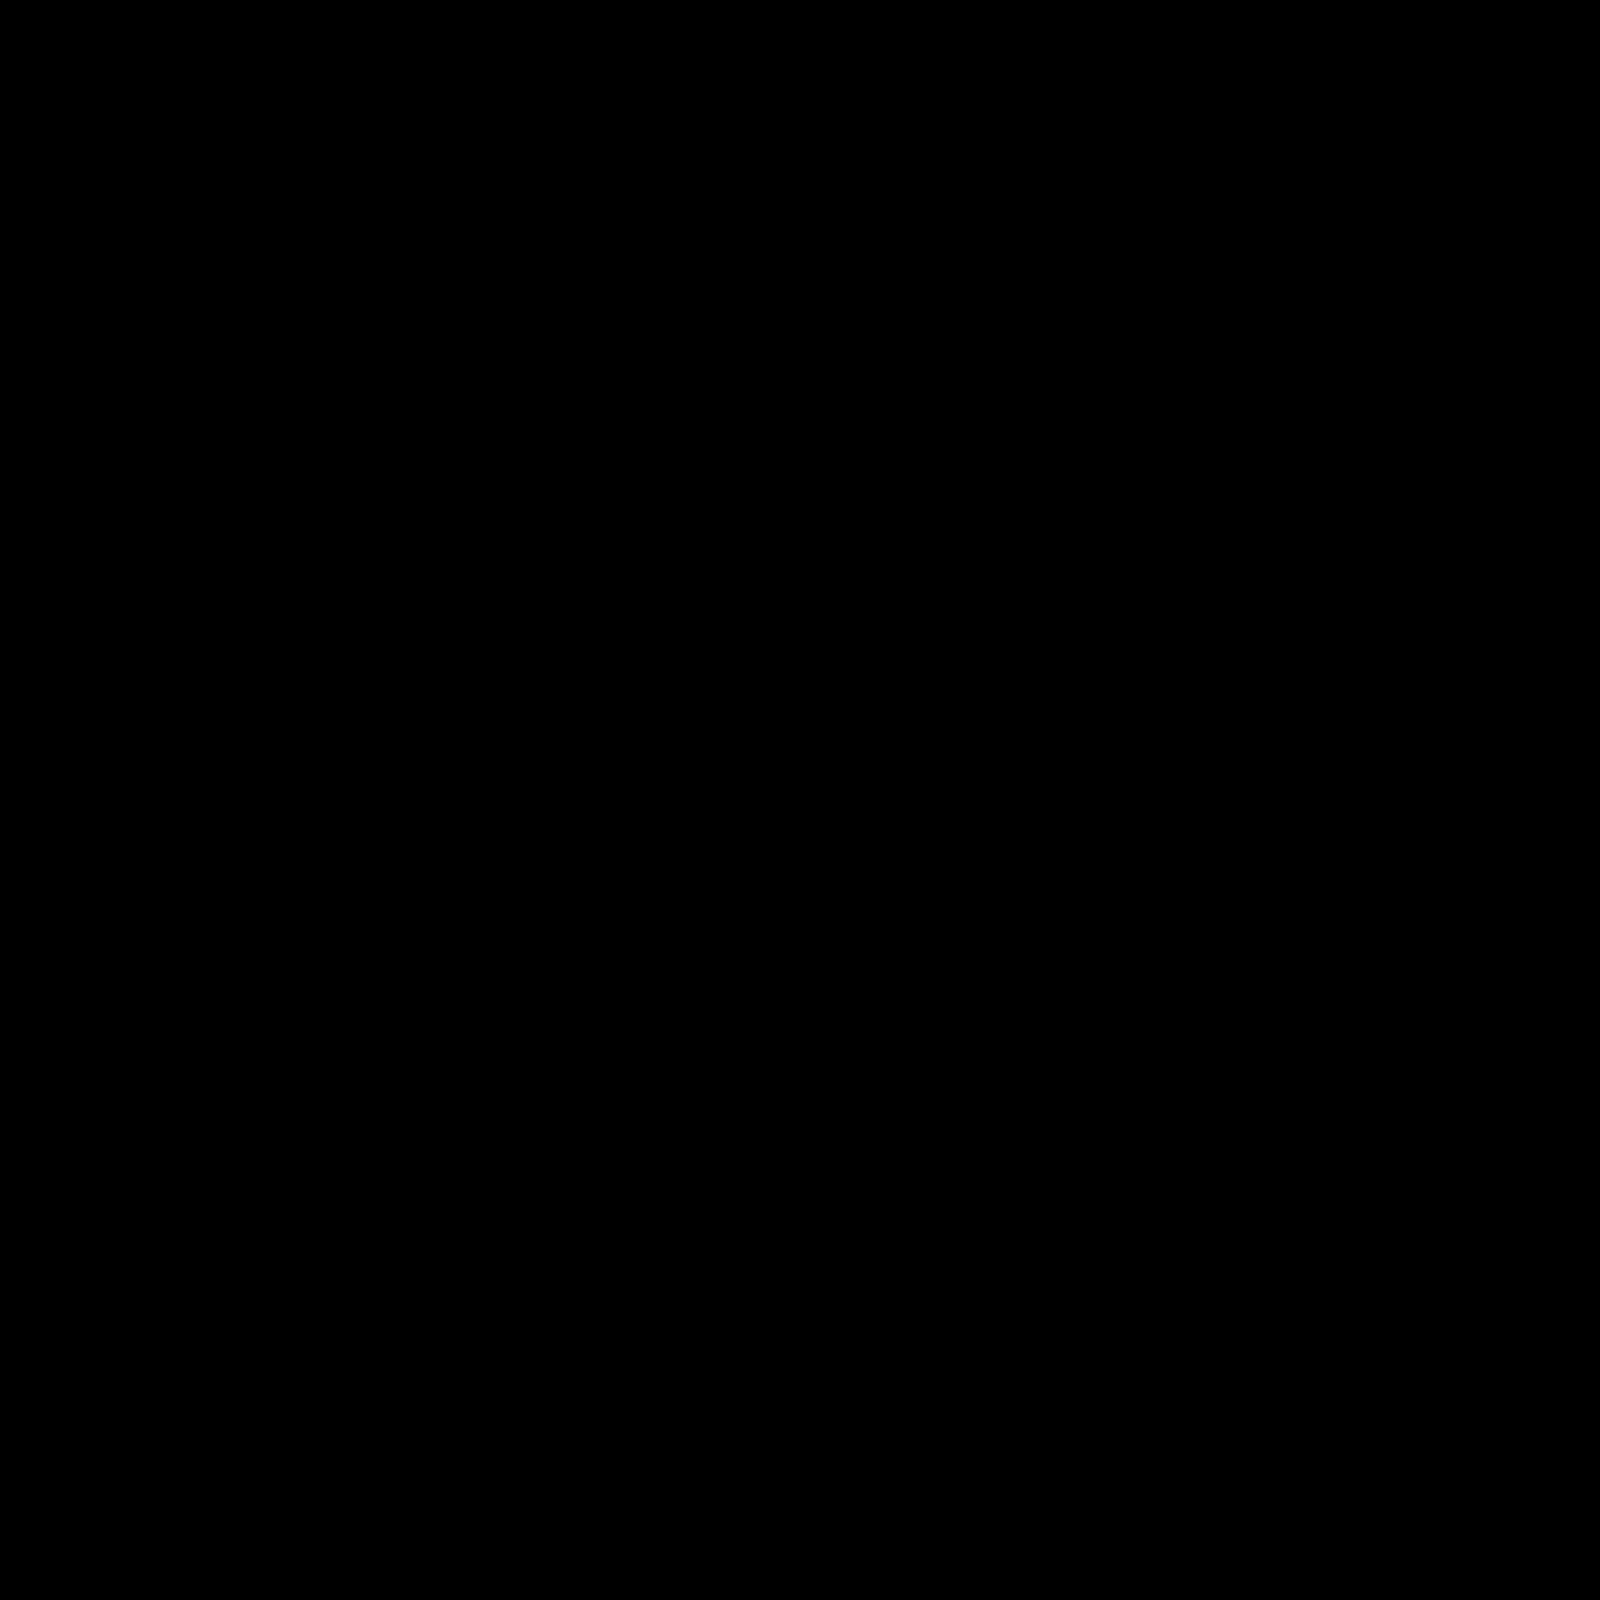 Arrow Pointing Down icon